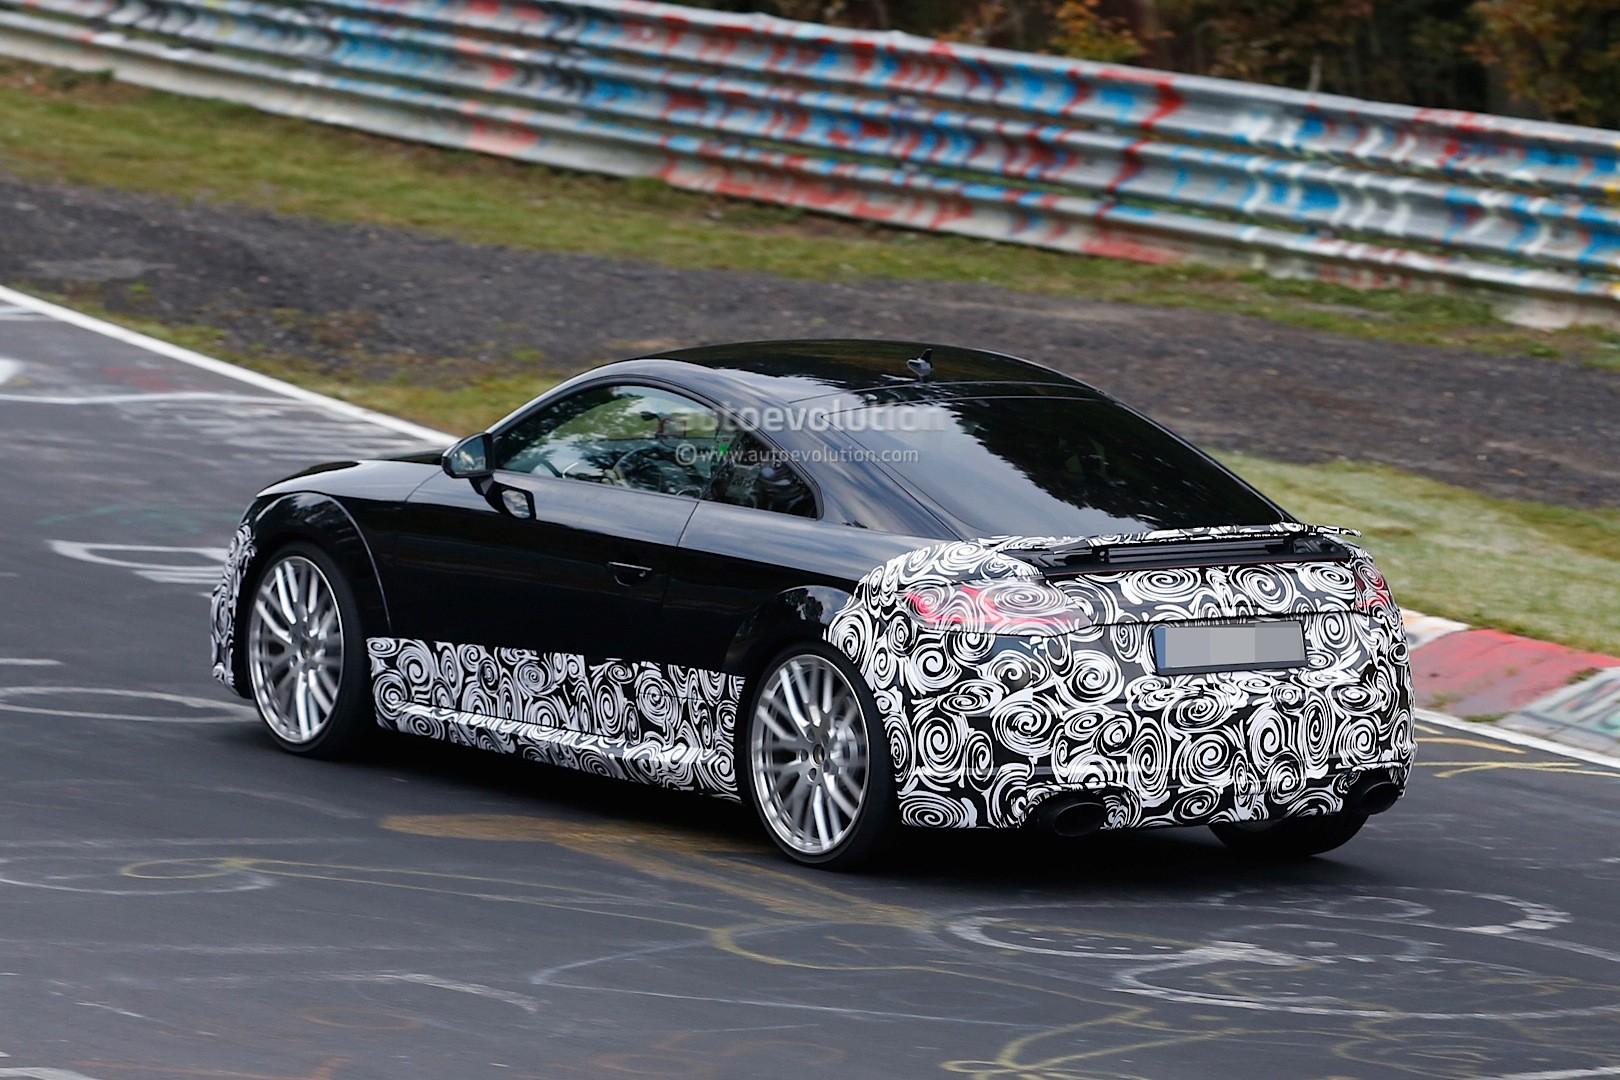 Spyshots: 2017 Audi TT-RS Production Model Seen for the ...